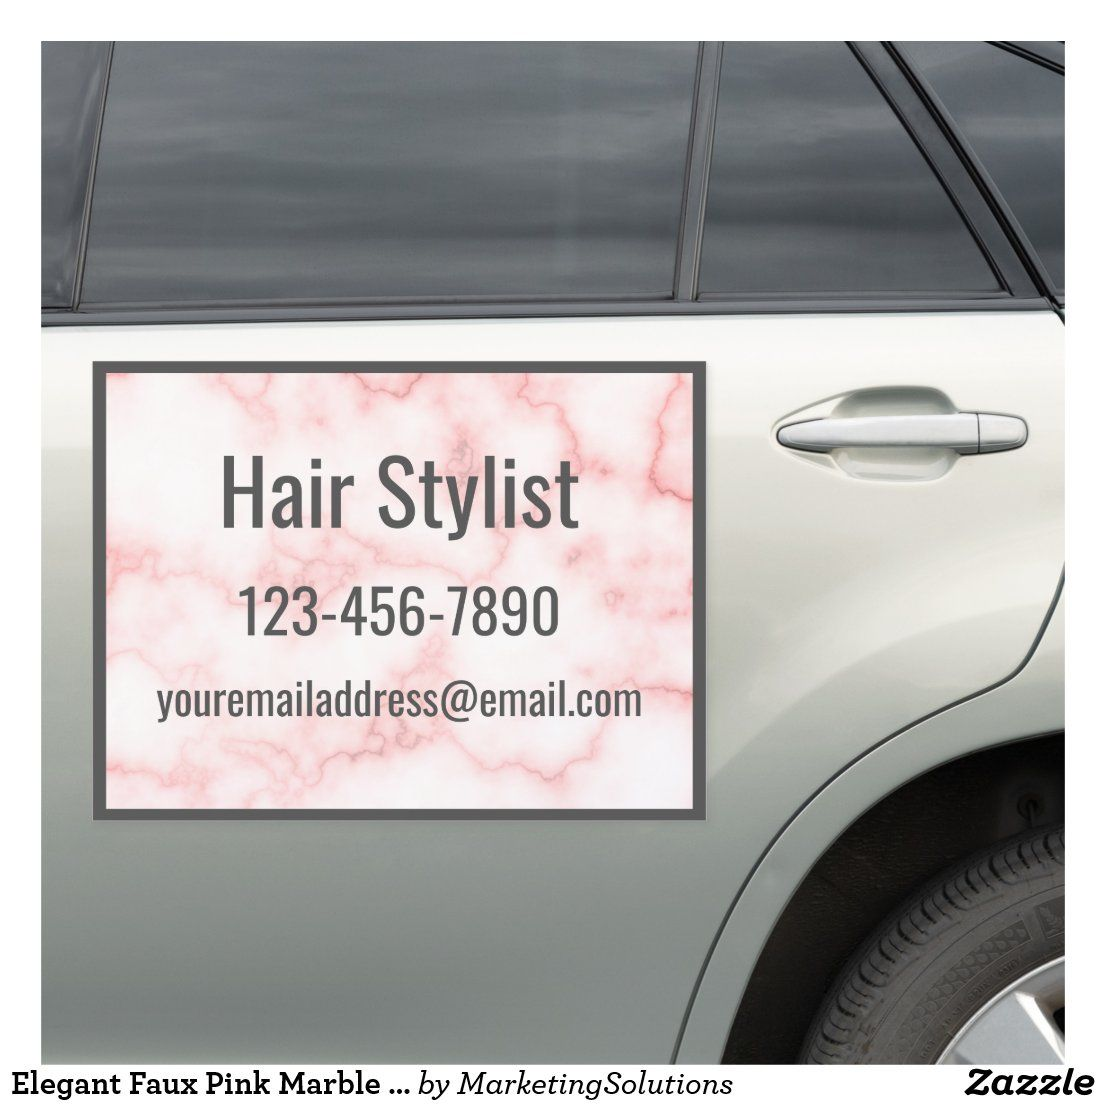 Elegant Faux Pink Marble Promotional Hair Stylist Car Magnet Zazzle Com Pink Marble Car Magnets Bumper Stickers [ 1106 x 1106 Pixel ]